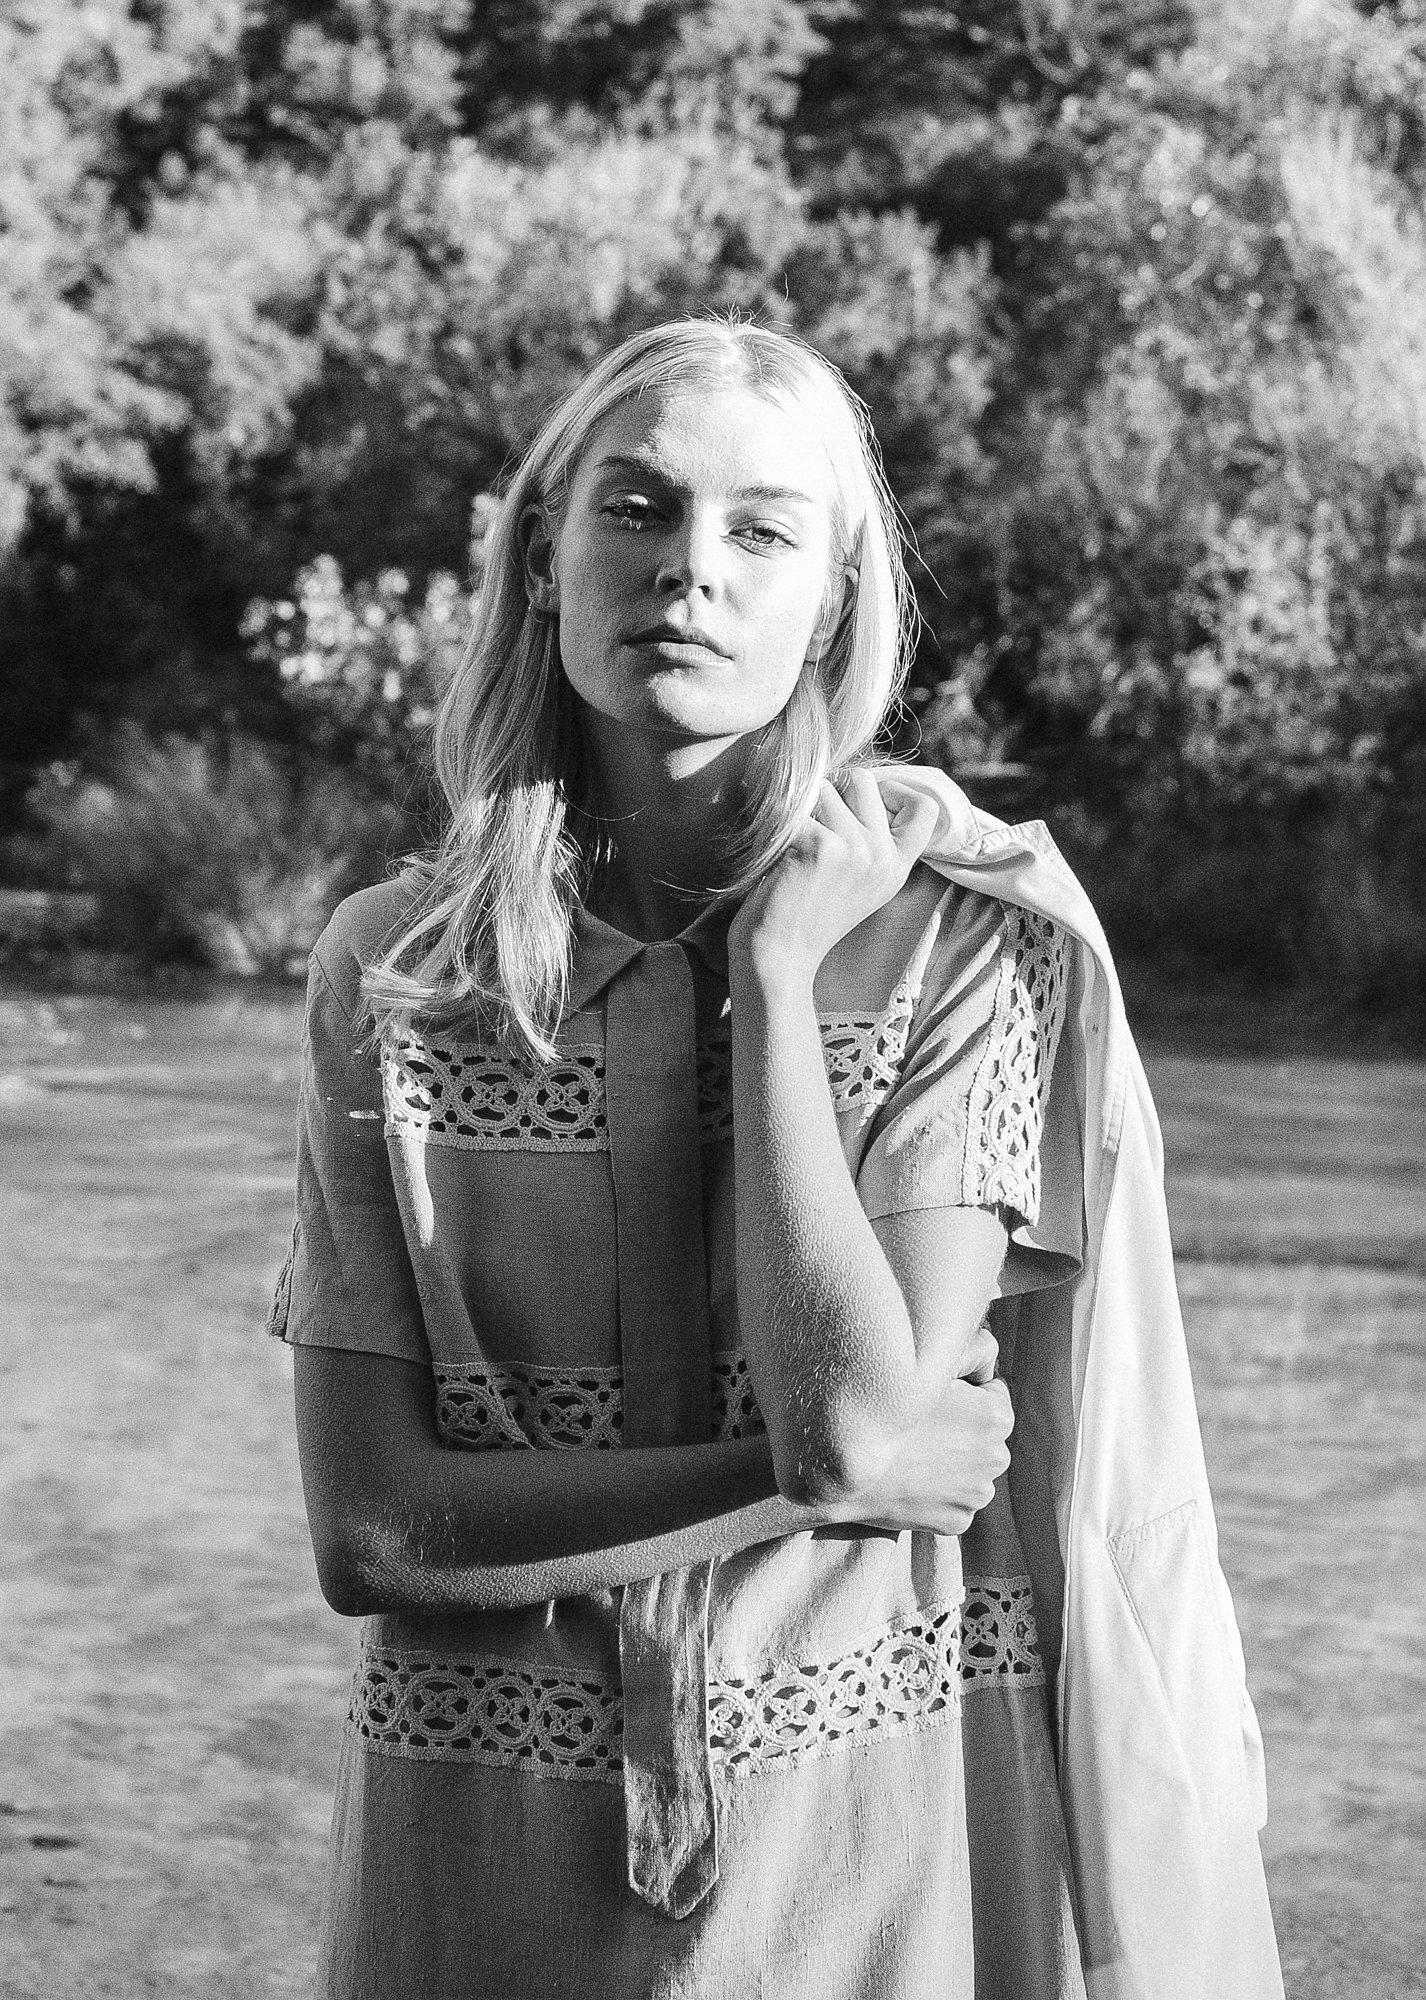 Pieceology-Vintage-1950s-Natural-Linen-Collared-Dress-Macrame Details-4.jpg